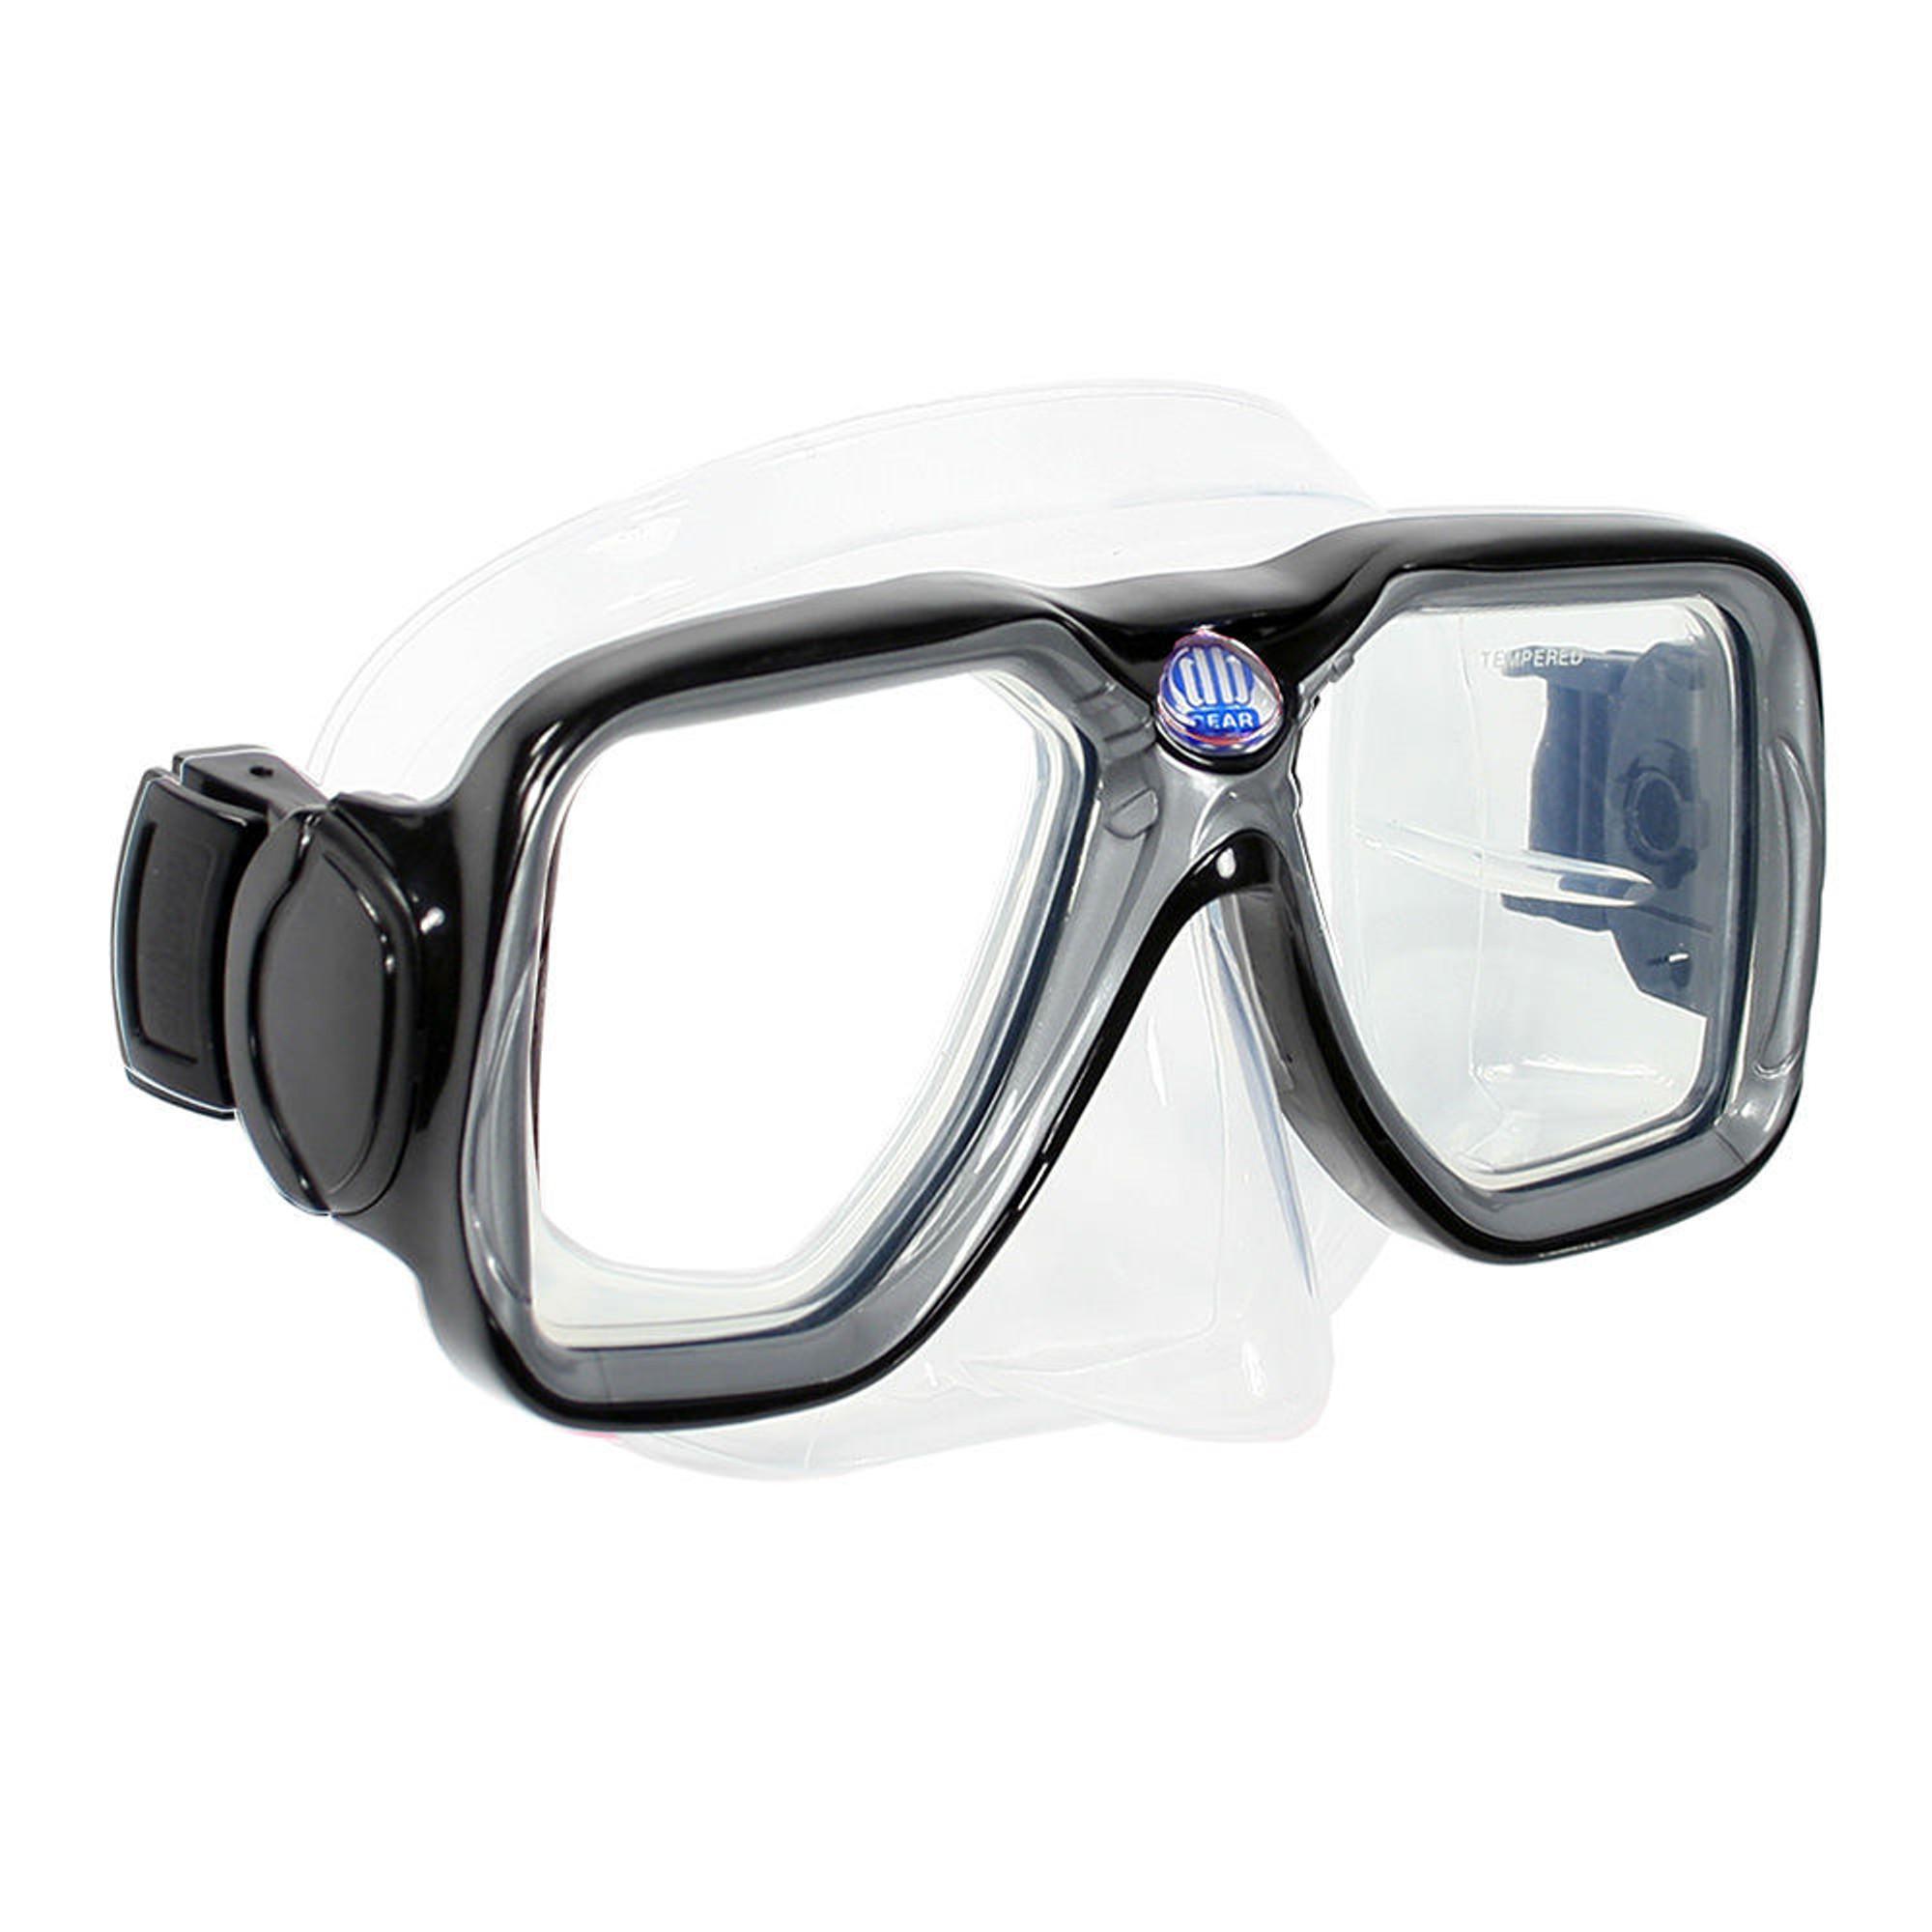 Maui - Adult Mask and Snorkel Set